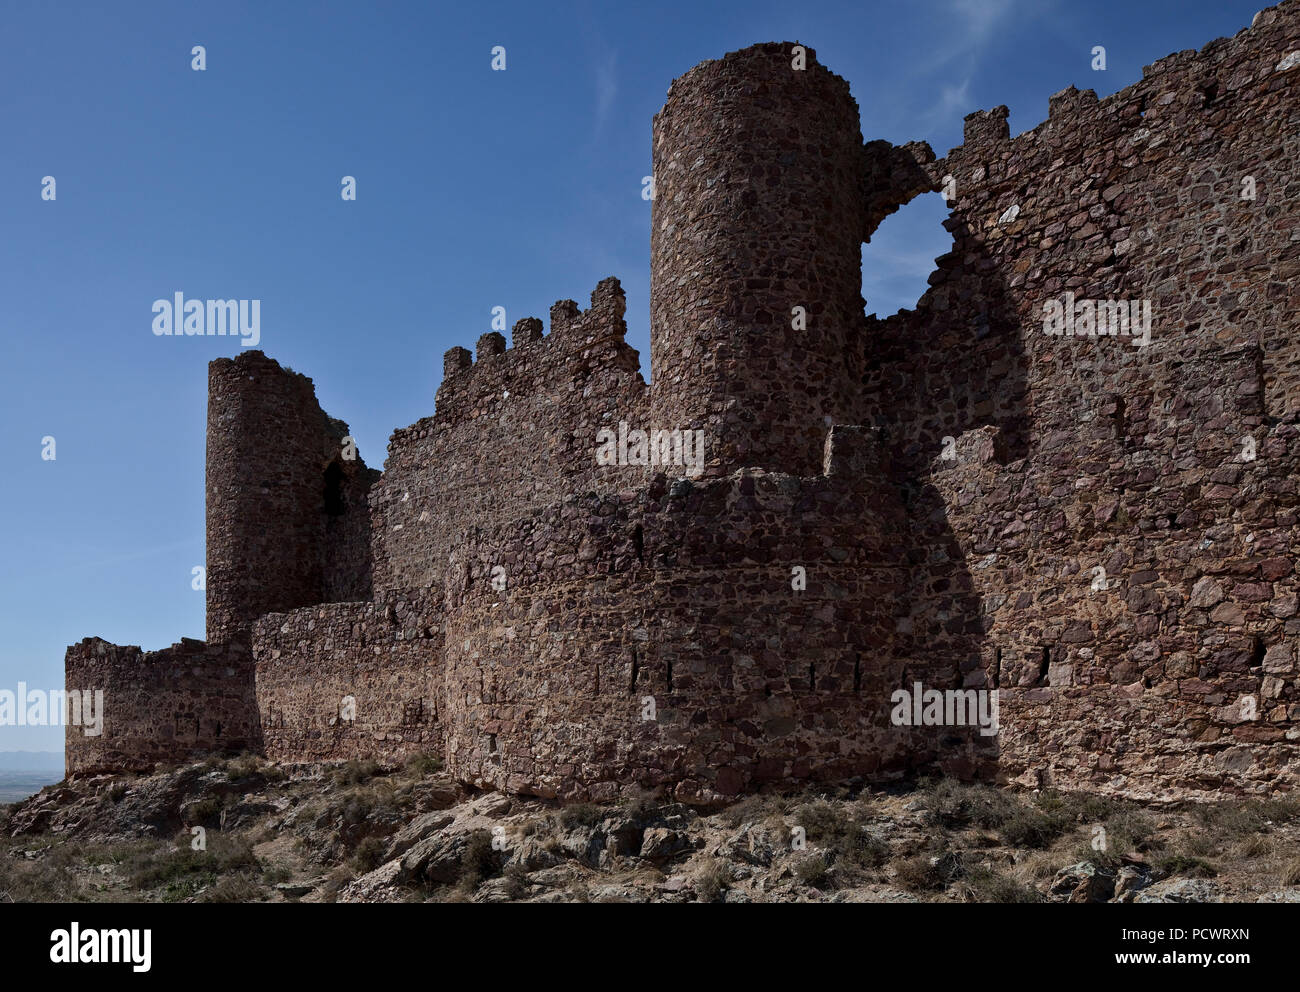 Castillo de Penas Negras Teilanaicht von Außen - Stock Image